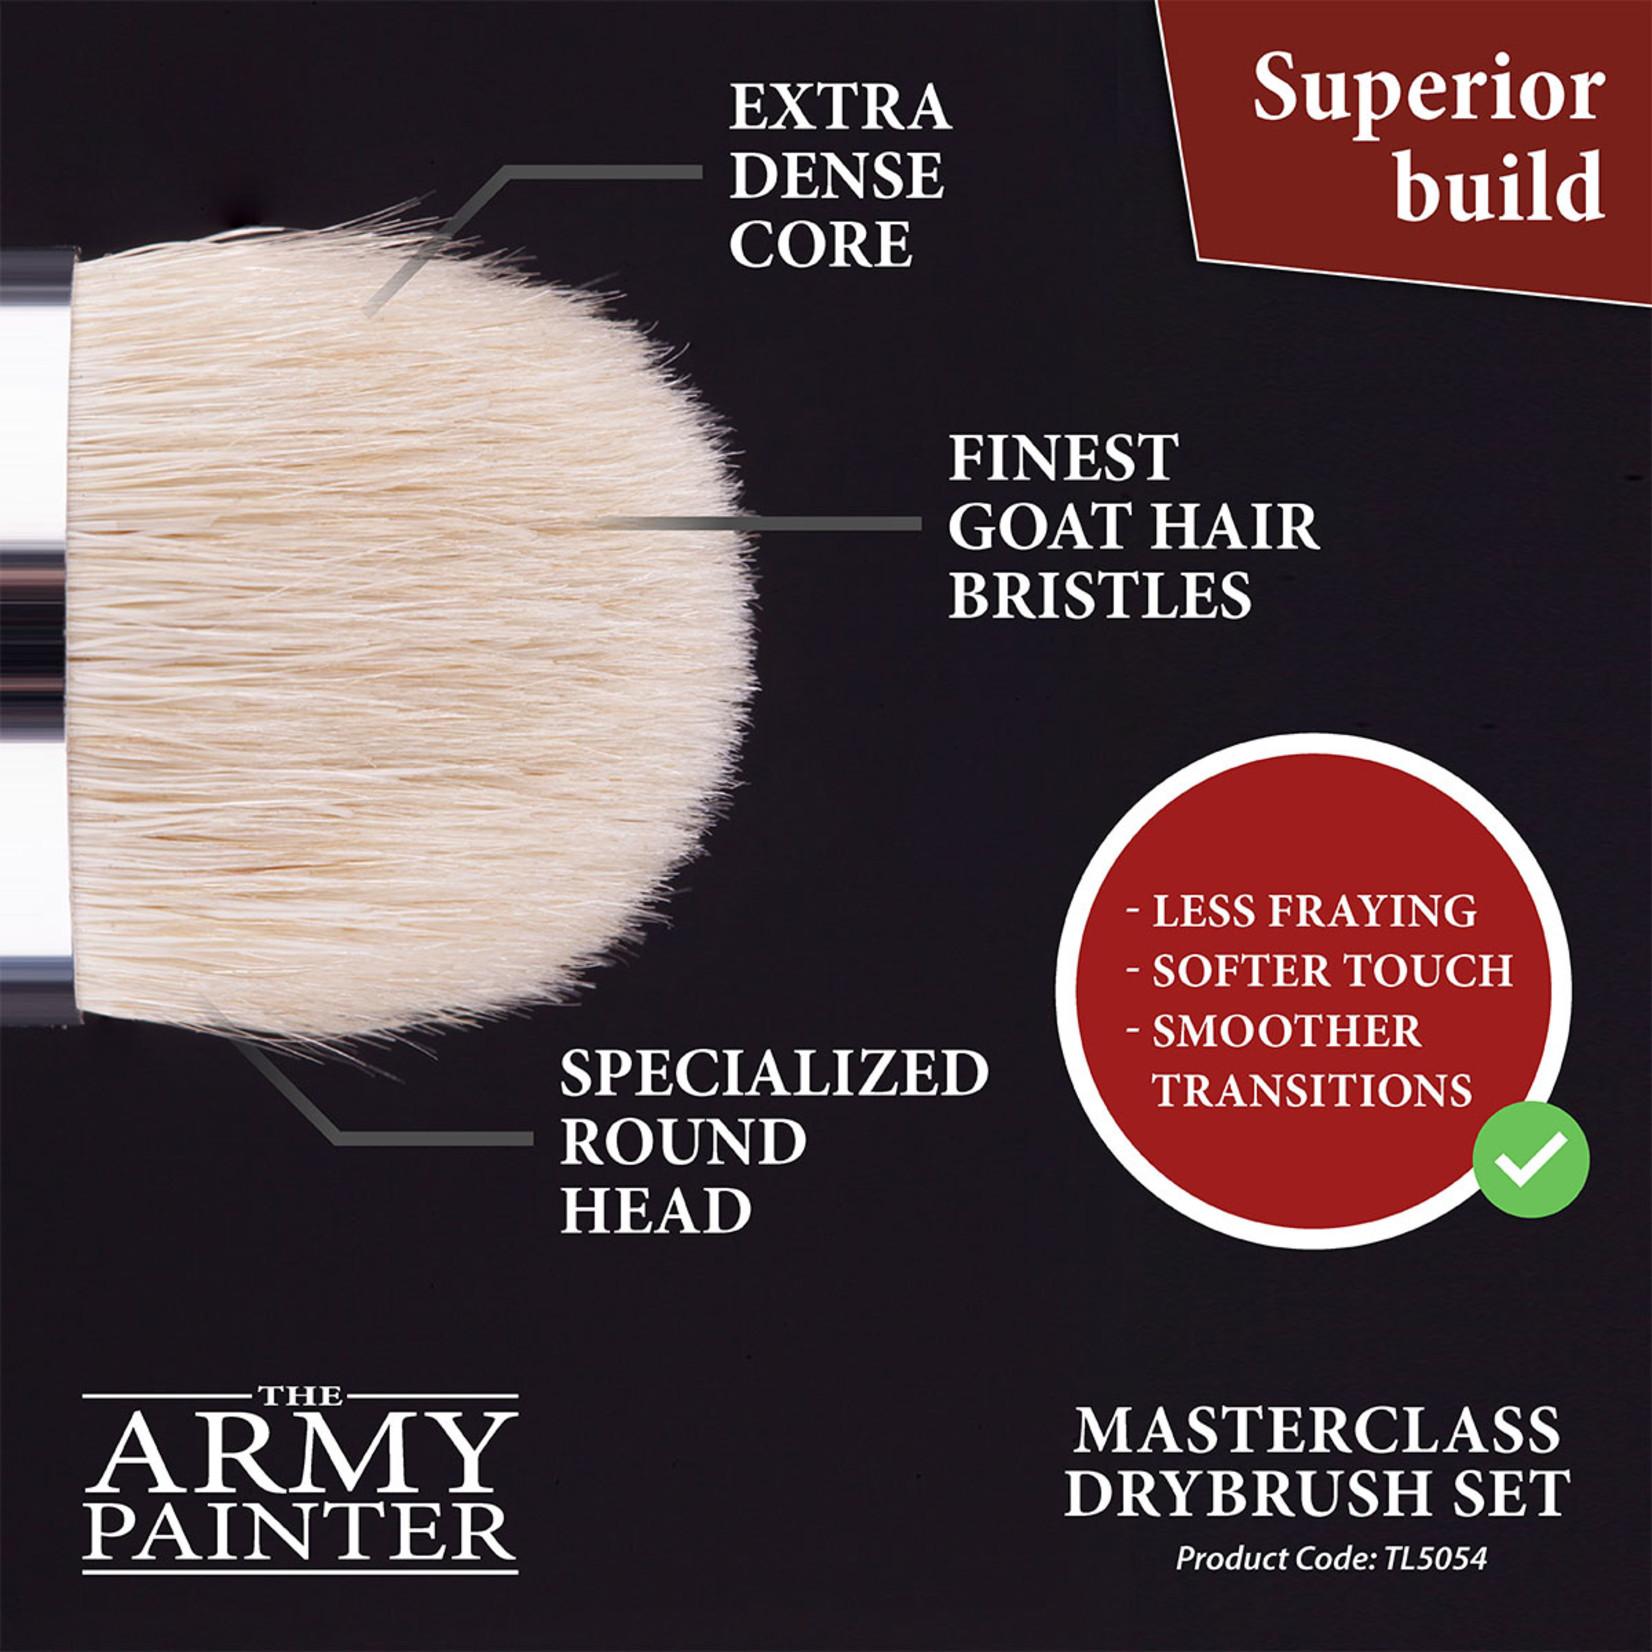 The Army Painter Masterclass: Drybrush Set